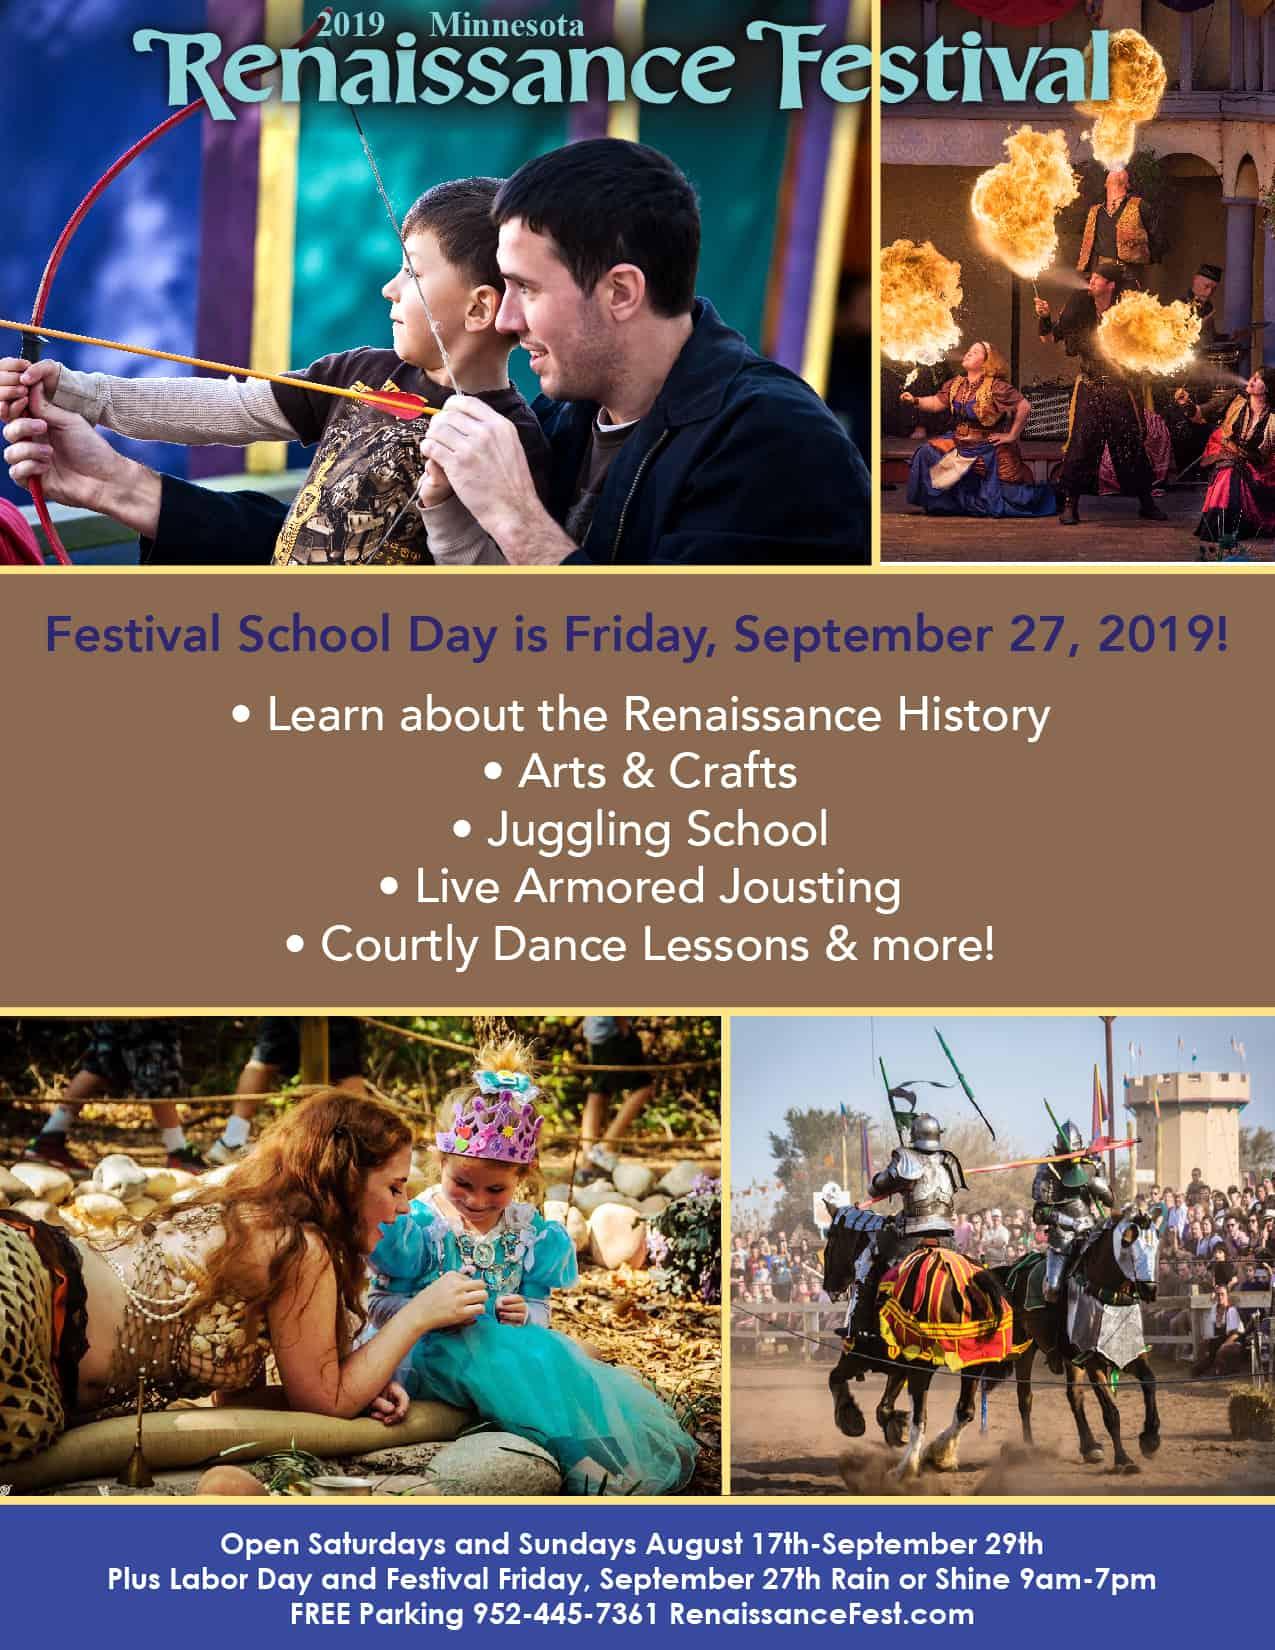 2019 Renaissance Festival School Day Registration Info